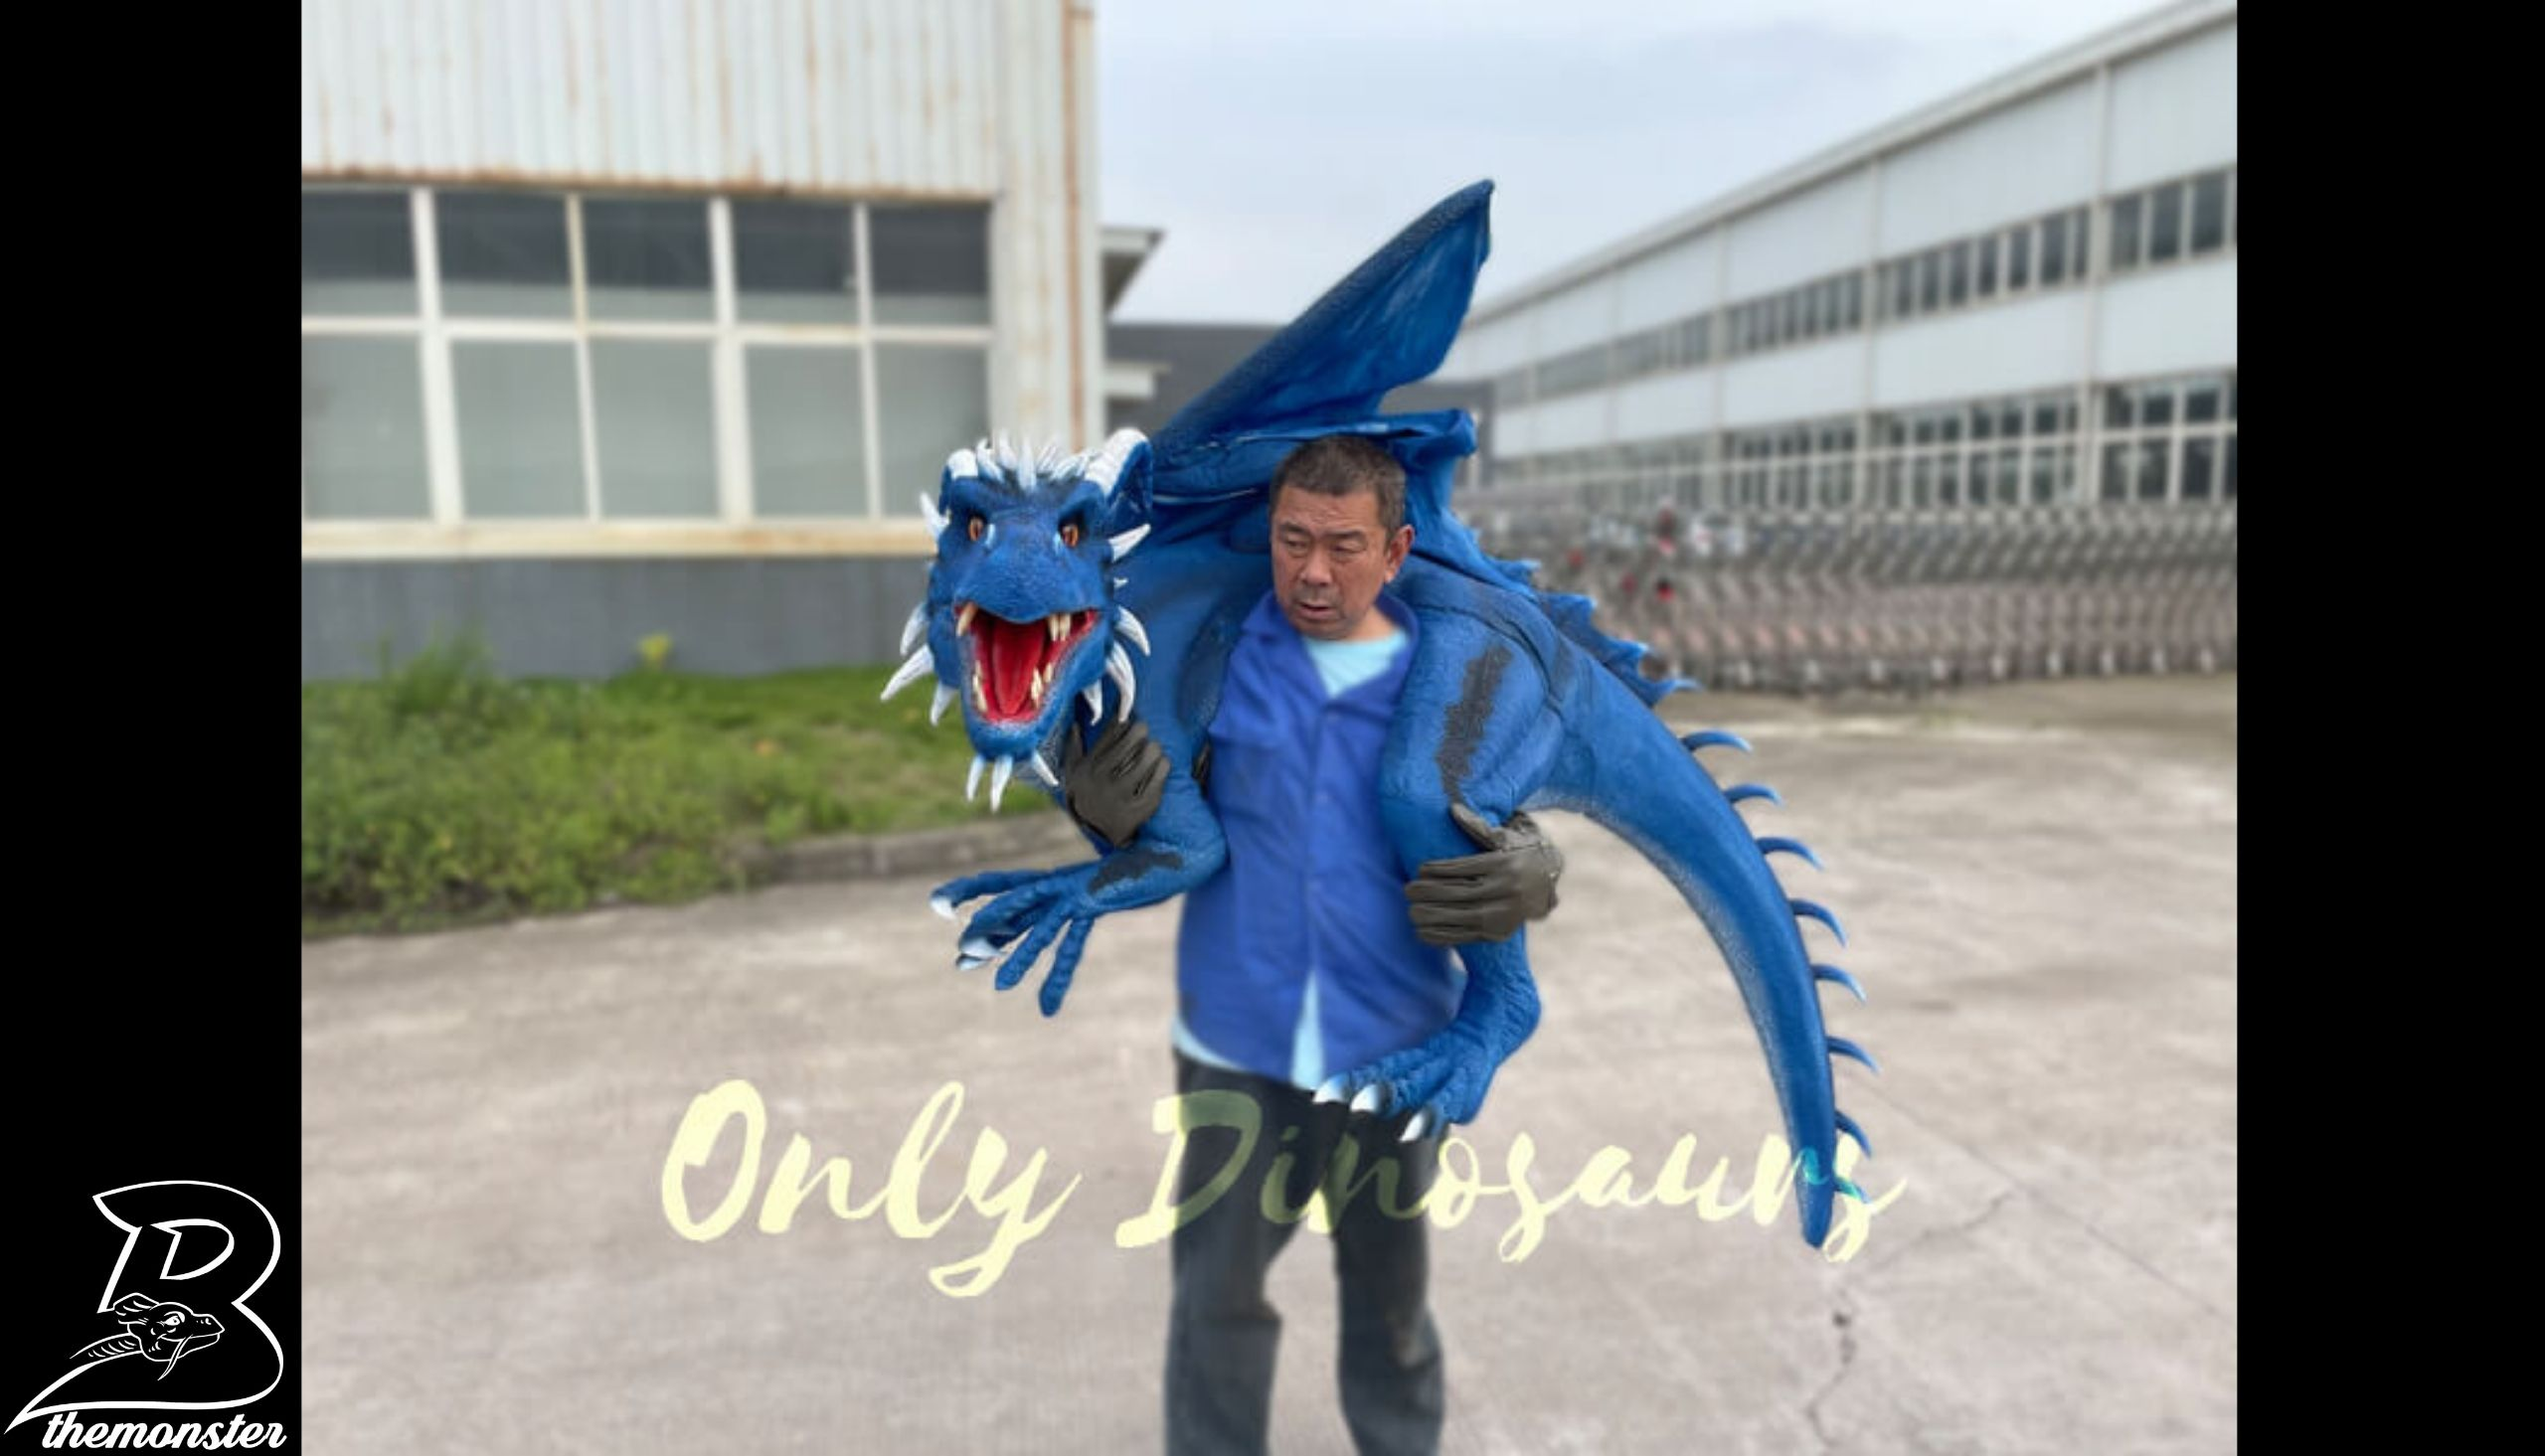 Vivid Flying Dragon Shoulder Puppet in vendita sul Bthemonster.com